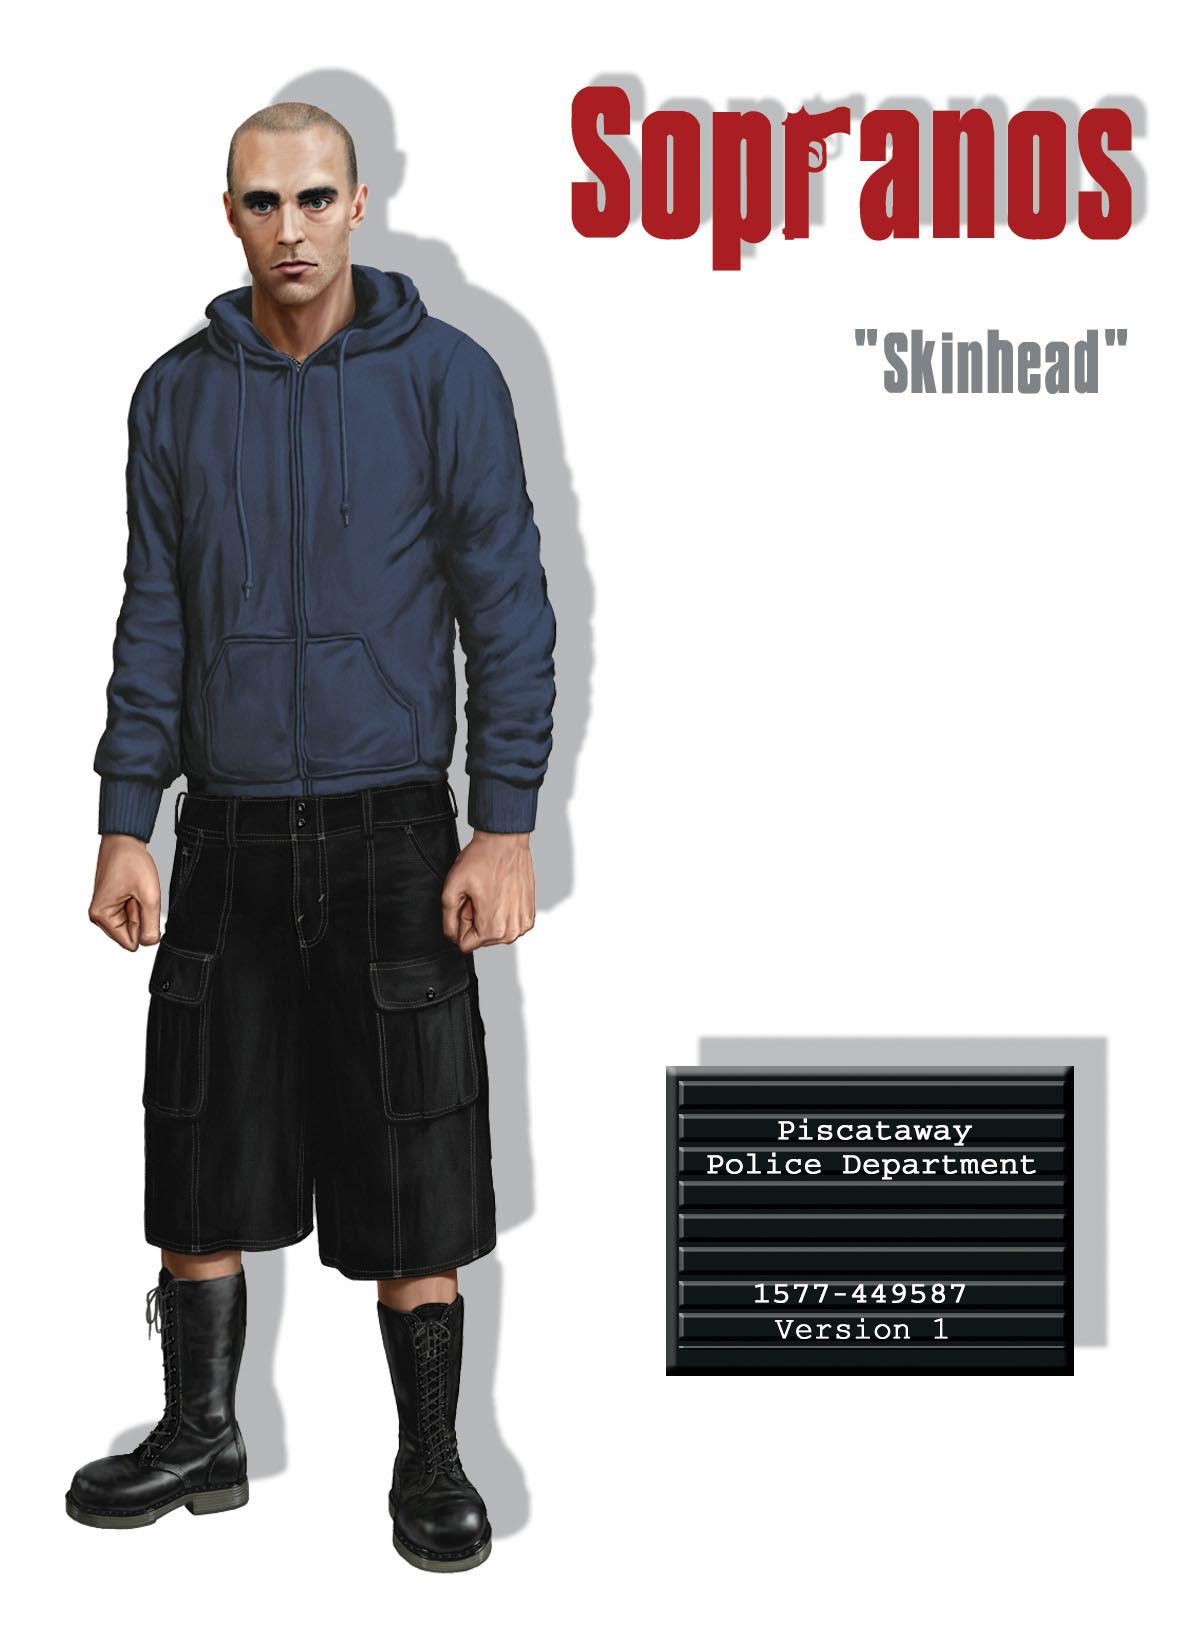 Jeff zugale sop 2nd skinhex concept 1